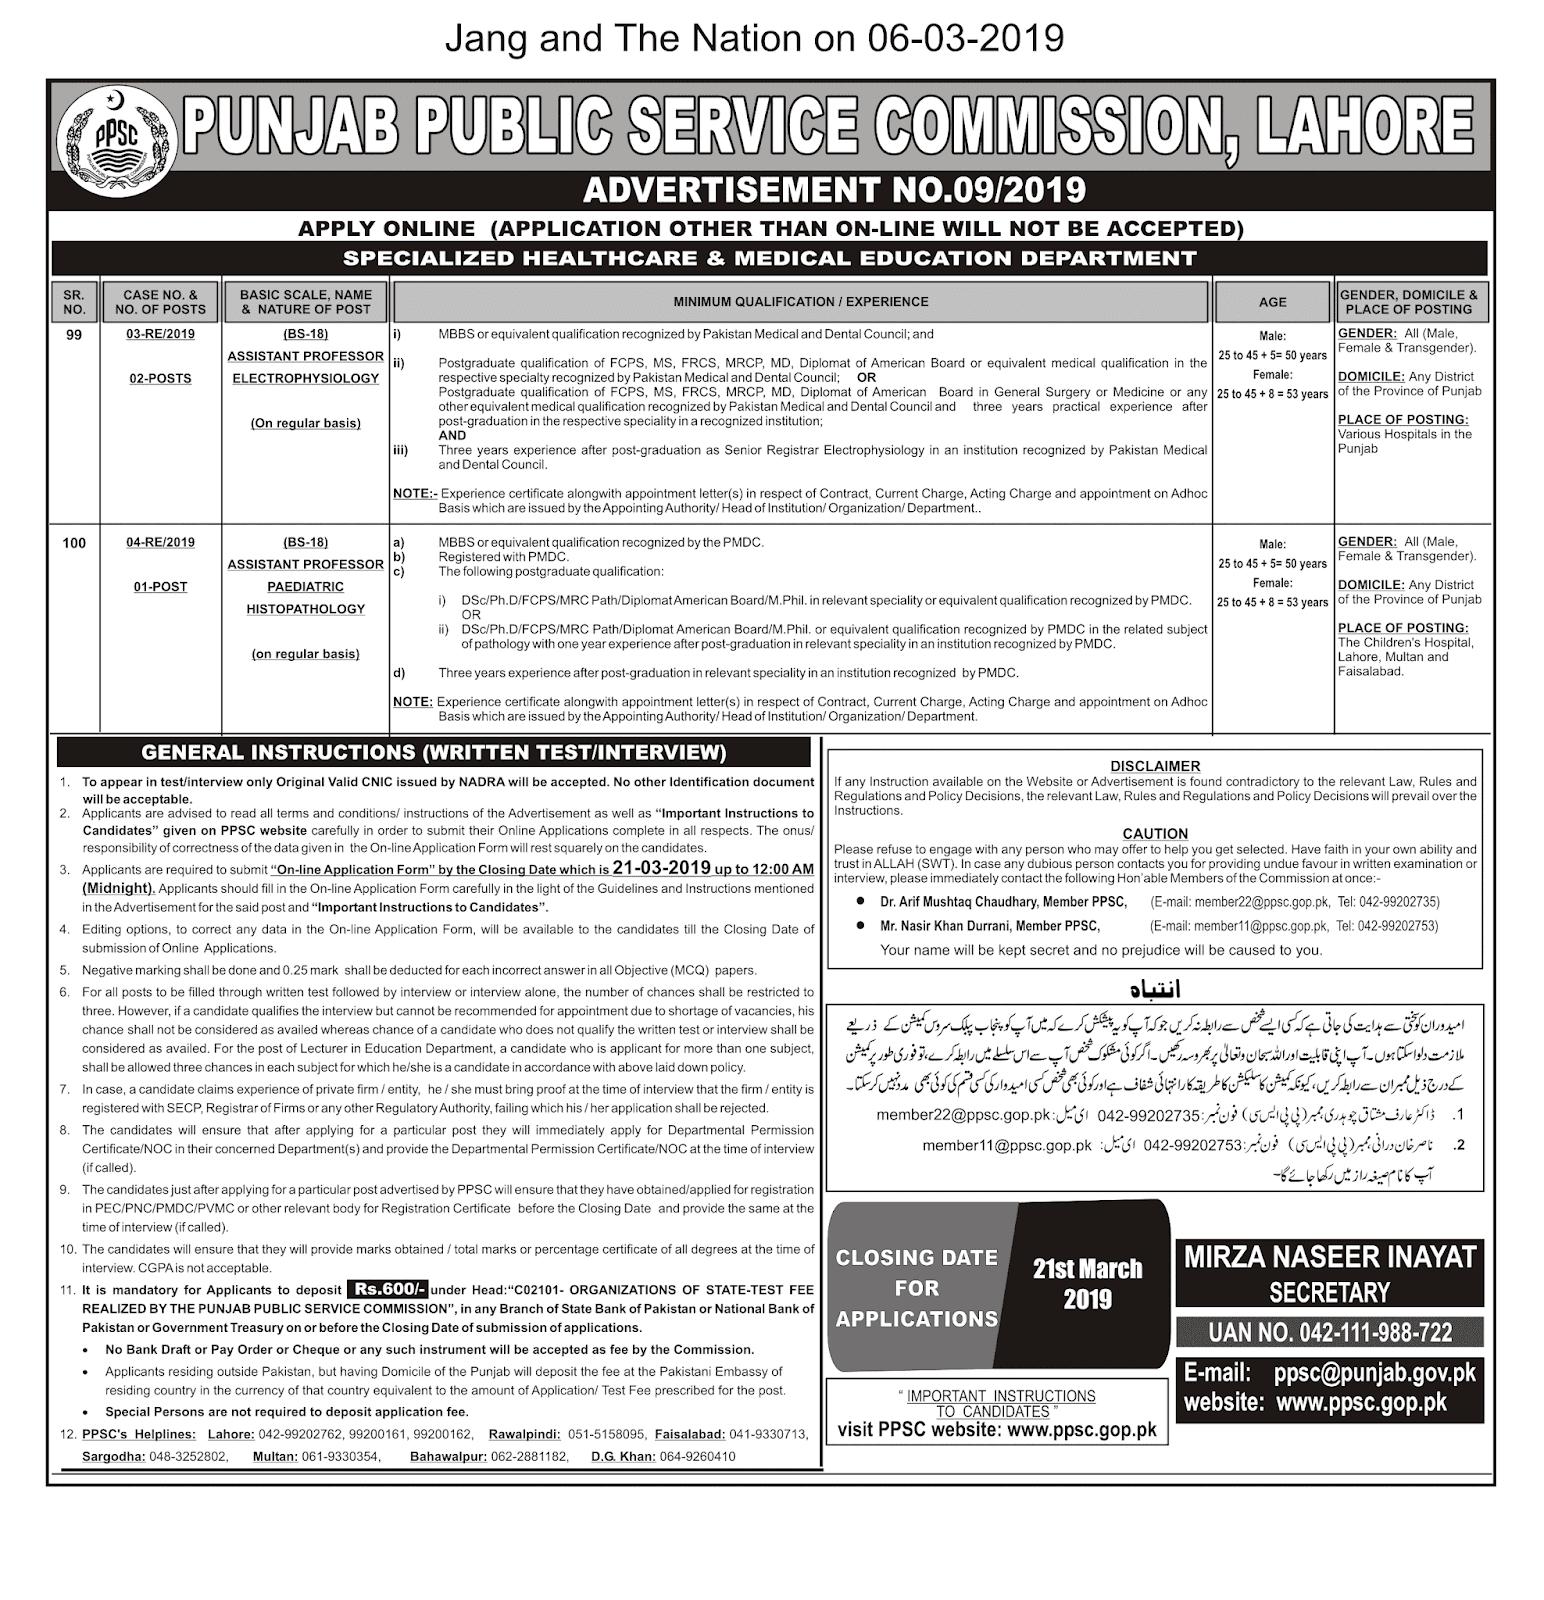 PPSC Advertisement 09/2019